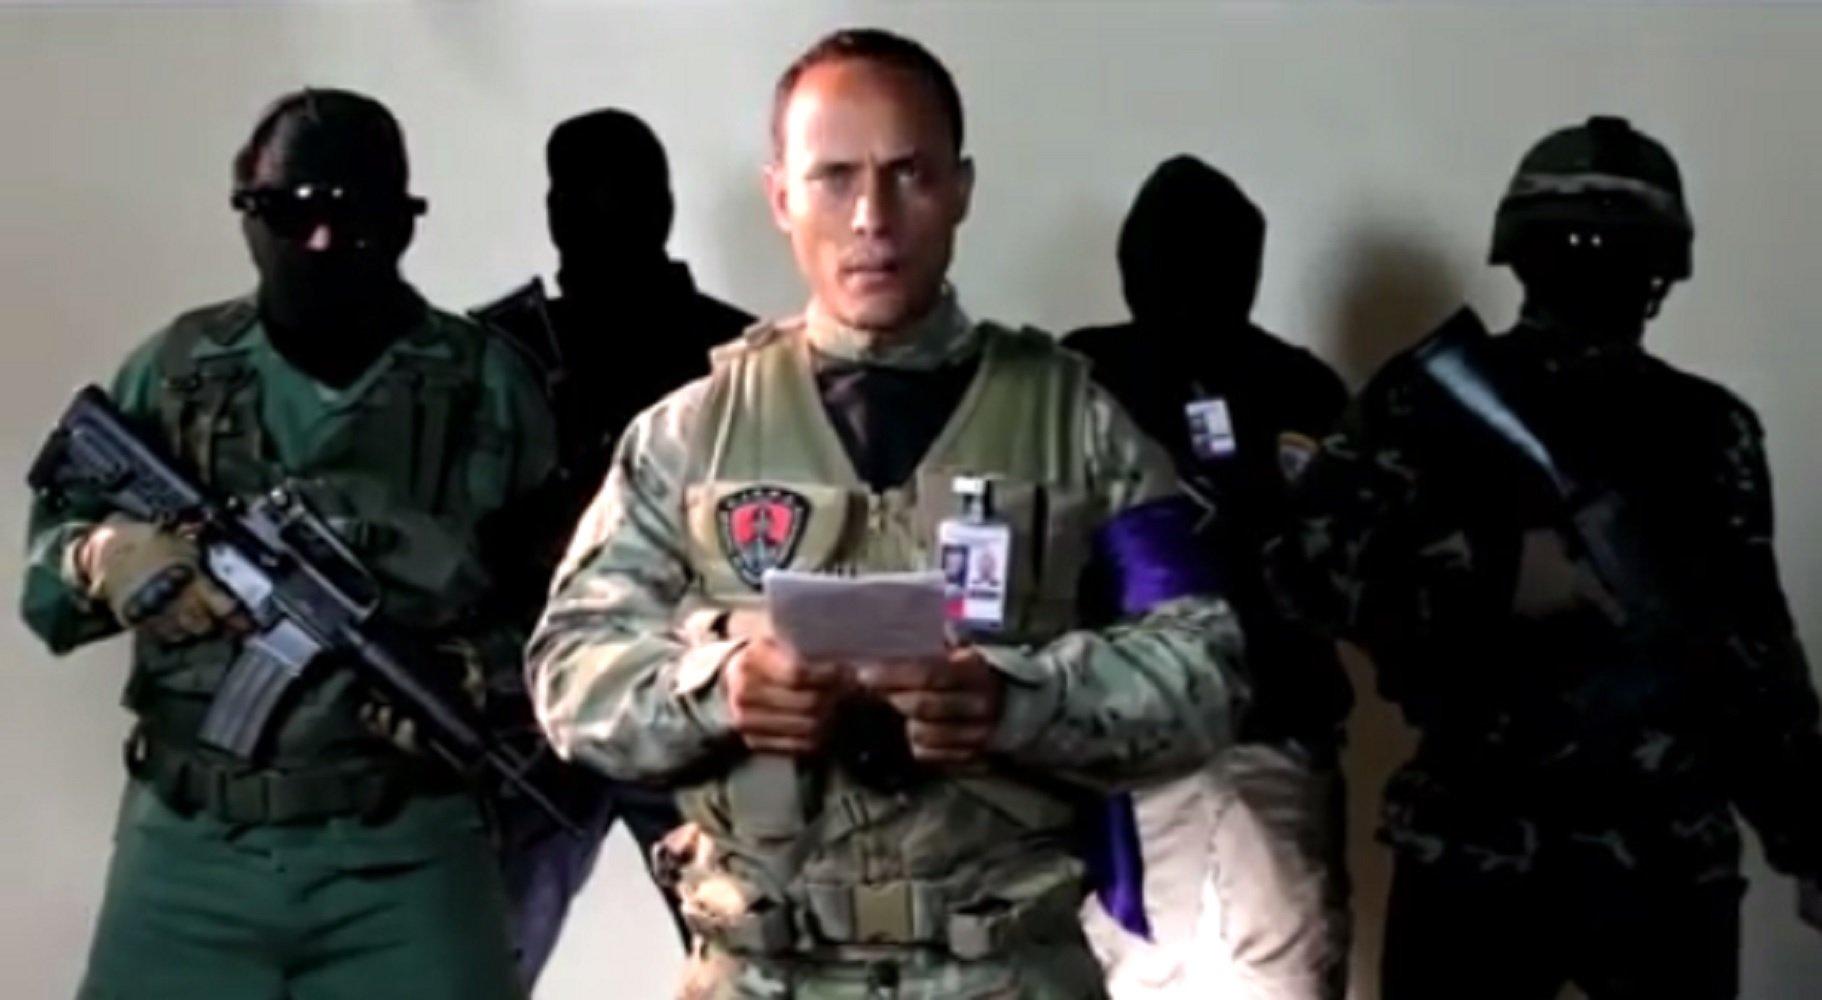 policia cop estat venezuela Oscarperezgv